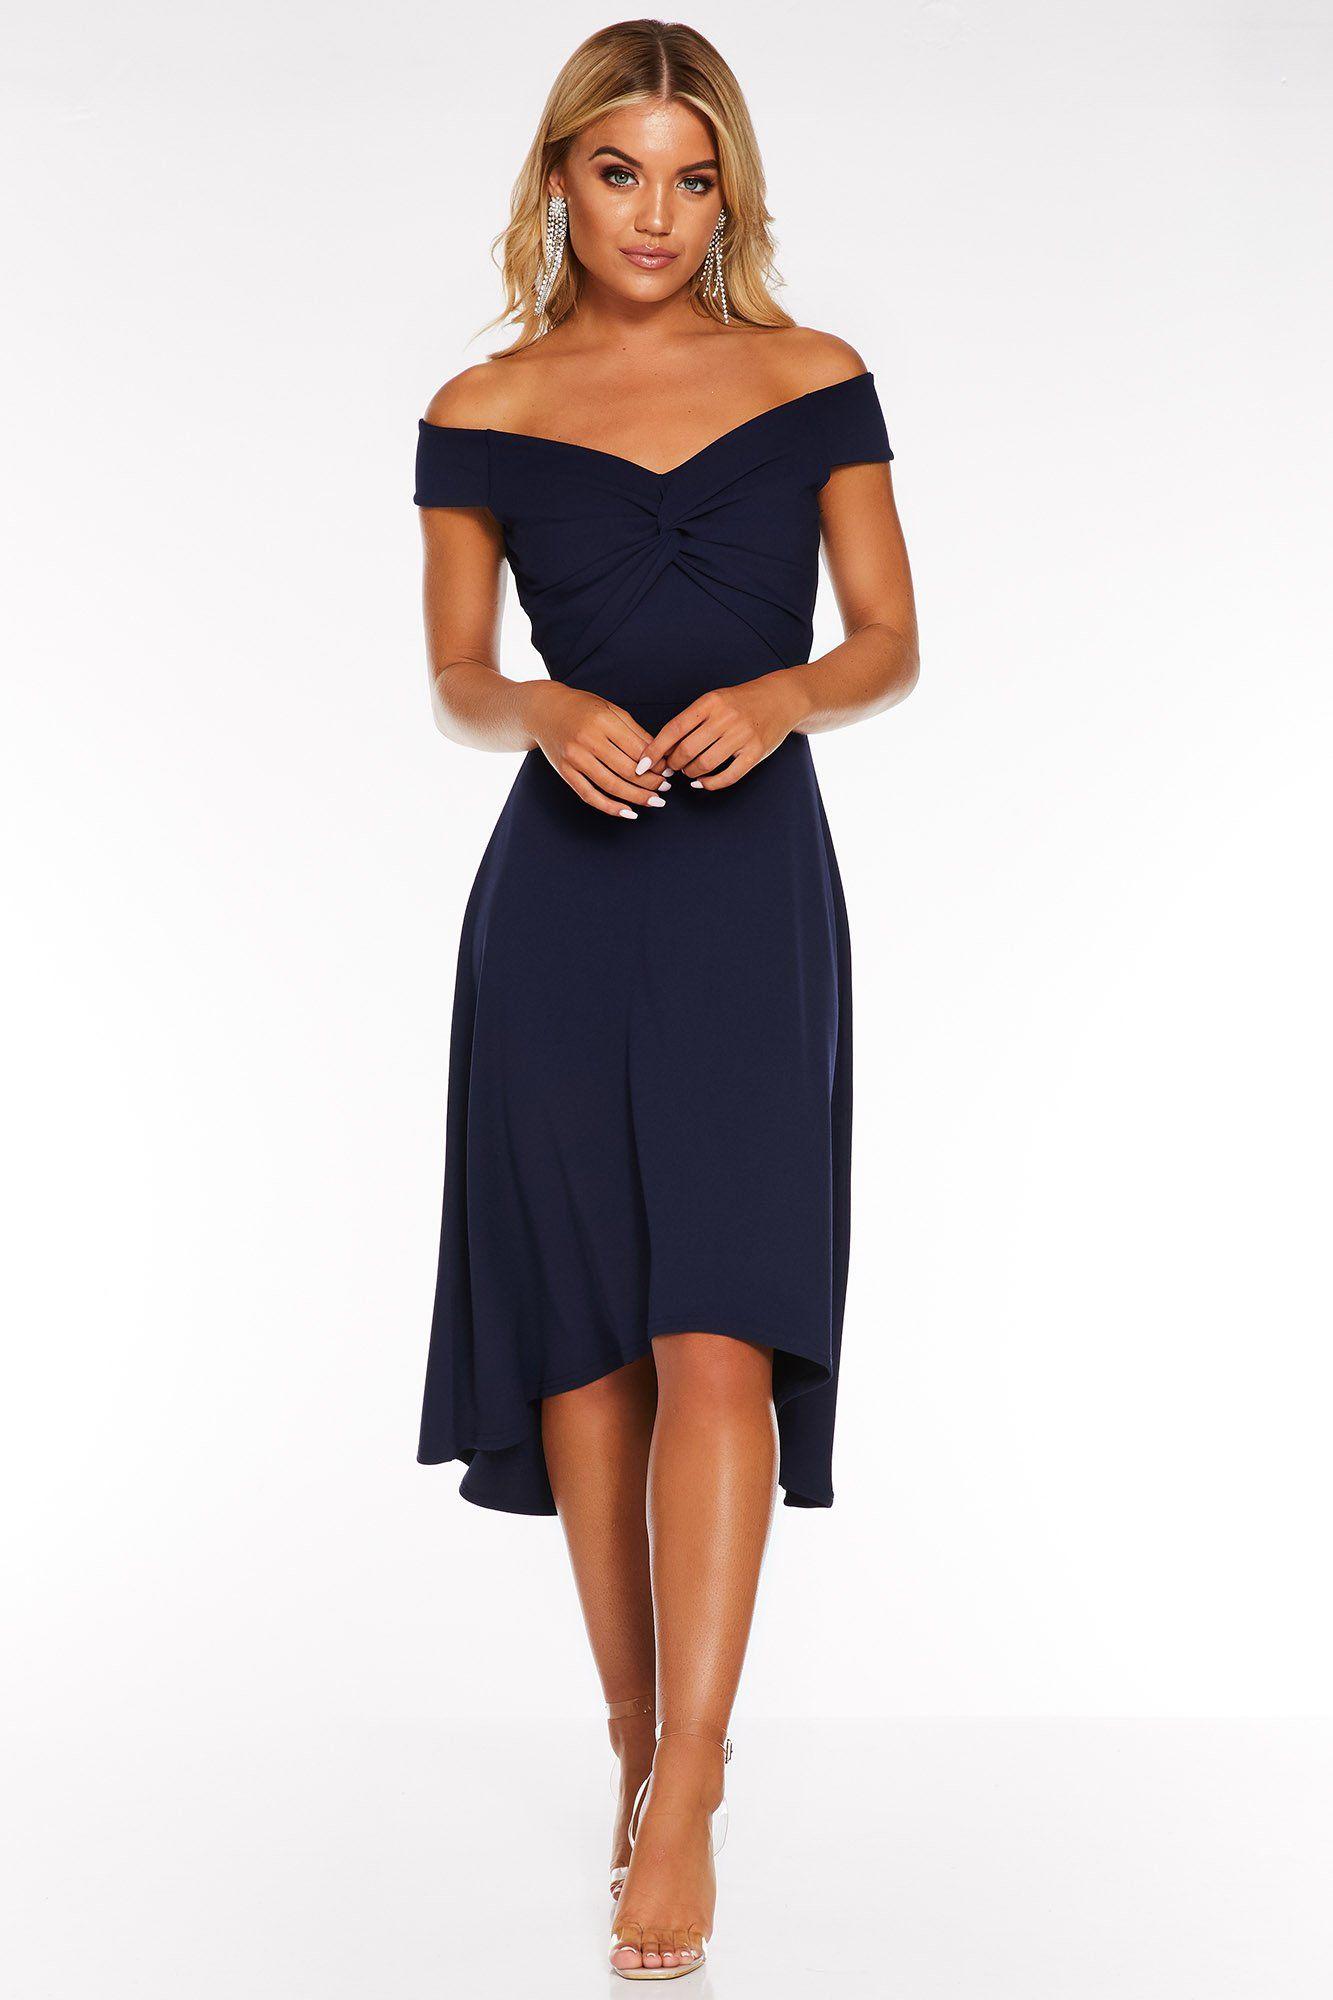 14+ Bardot wedding guest dress ideas in 2021